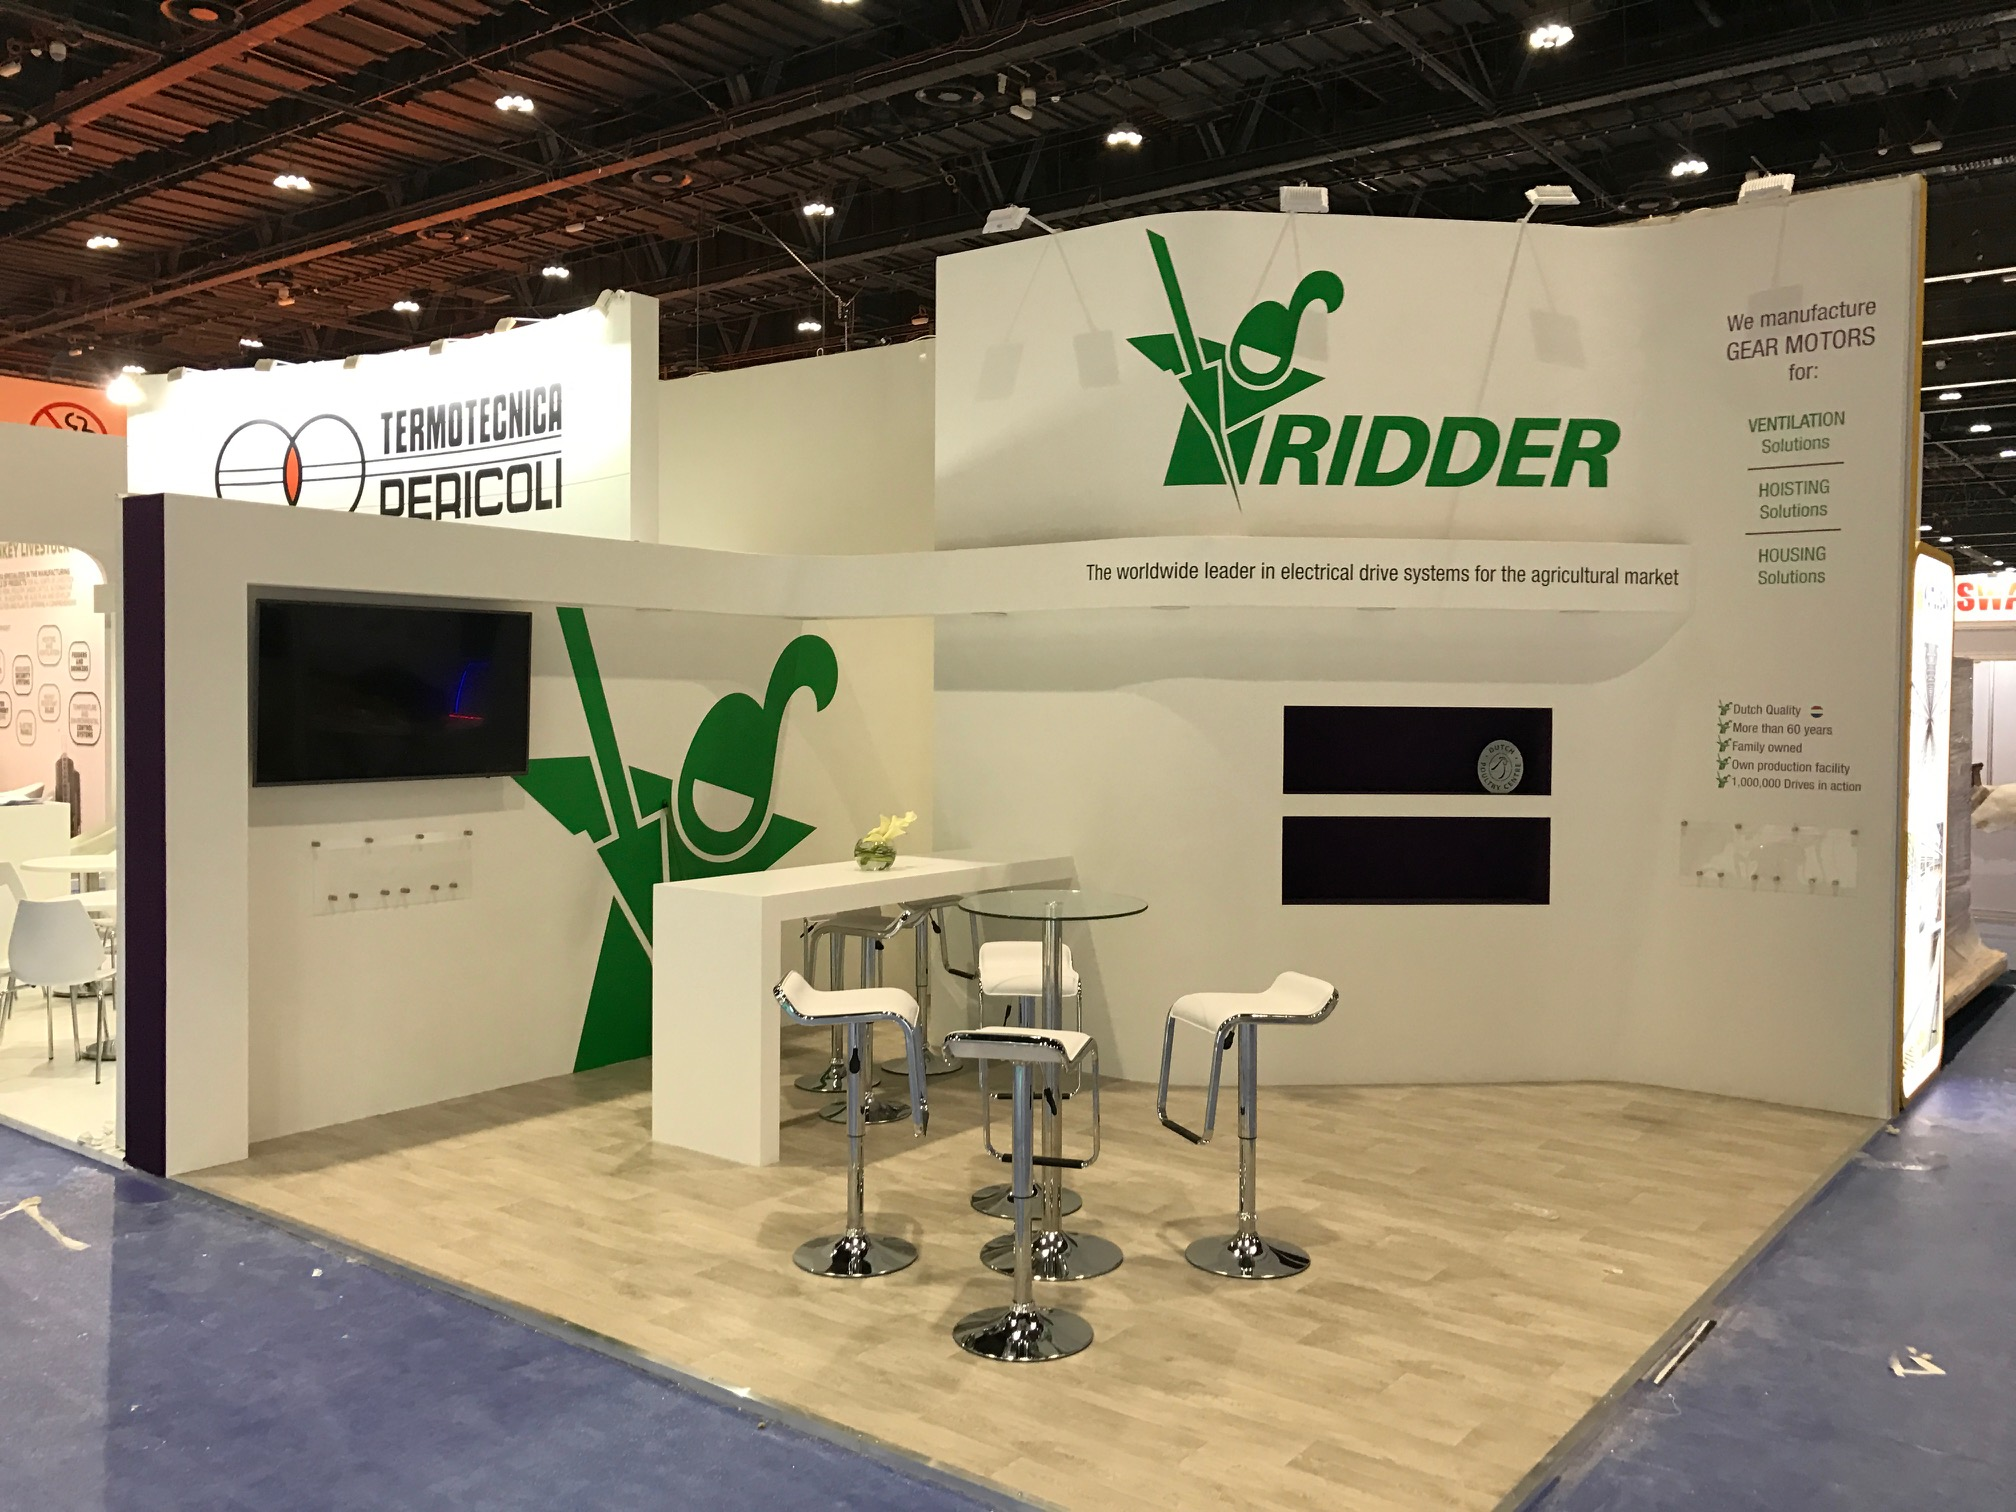 Bespoke exhibition stand for Ridder at ADNEC Abu Dhabi UAE VIV MEA 2018